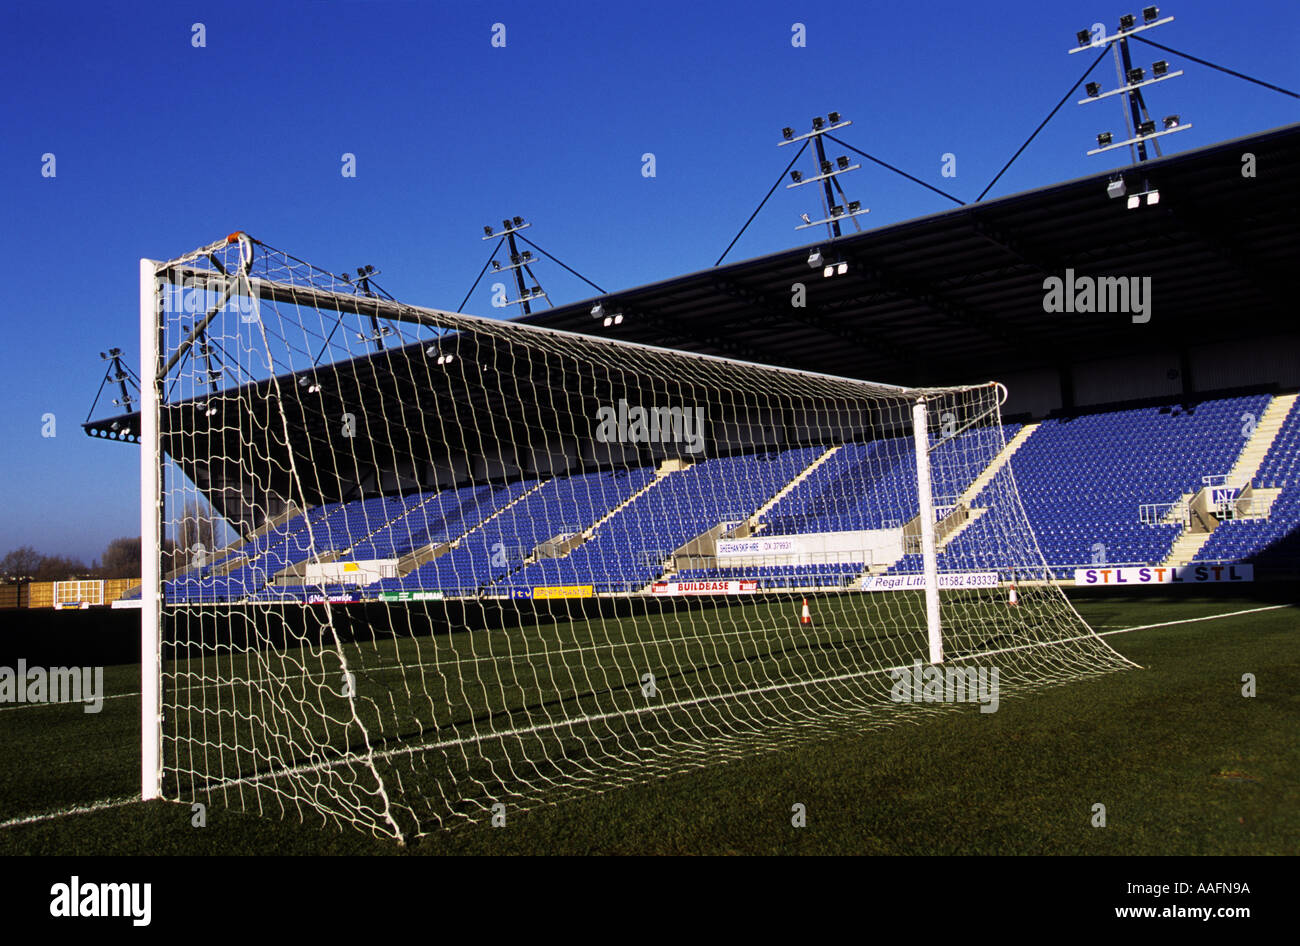 Kassam Stadium home to Oxford United Football Club - Stock Image